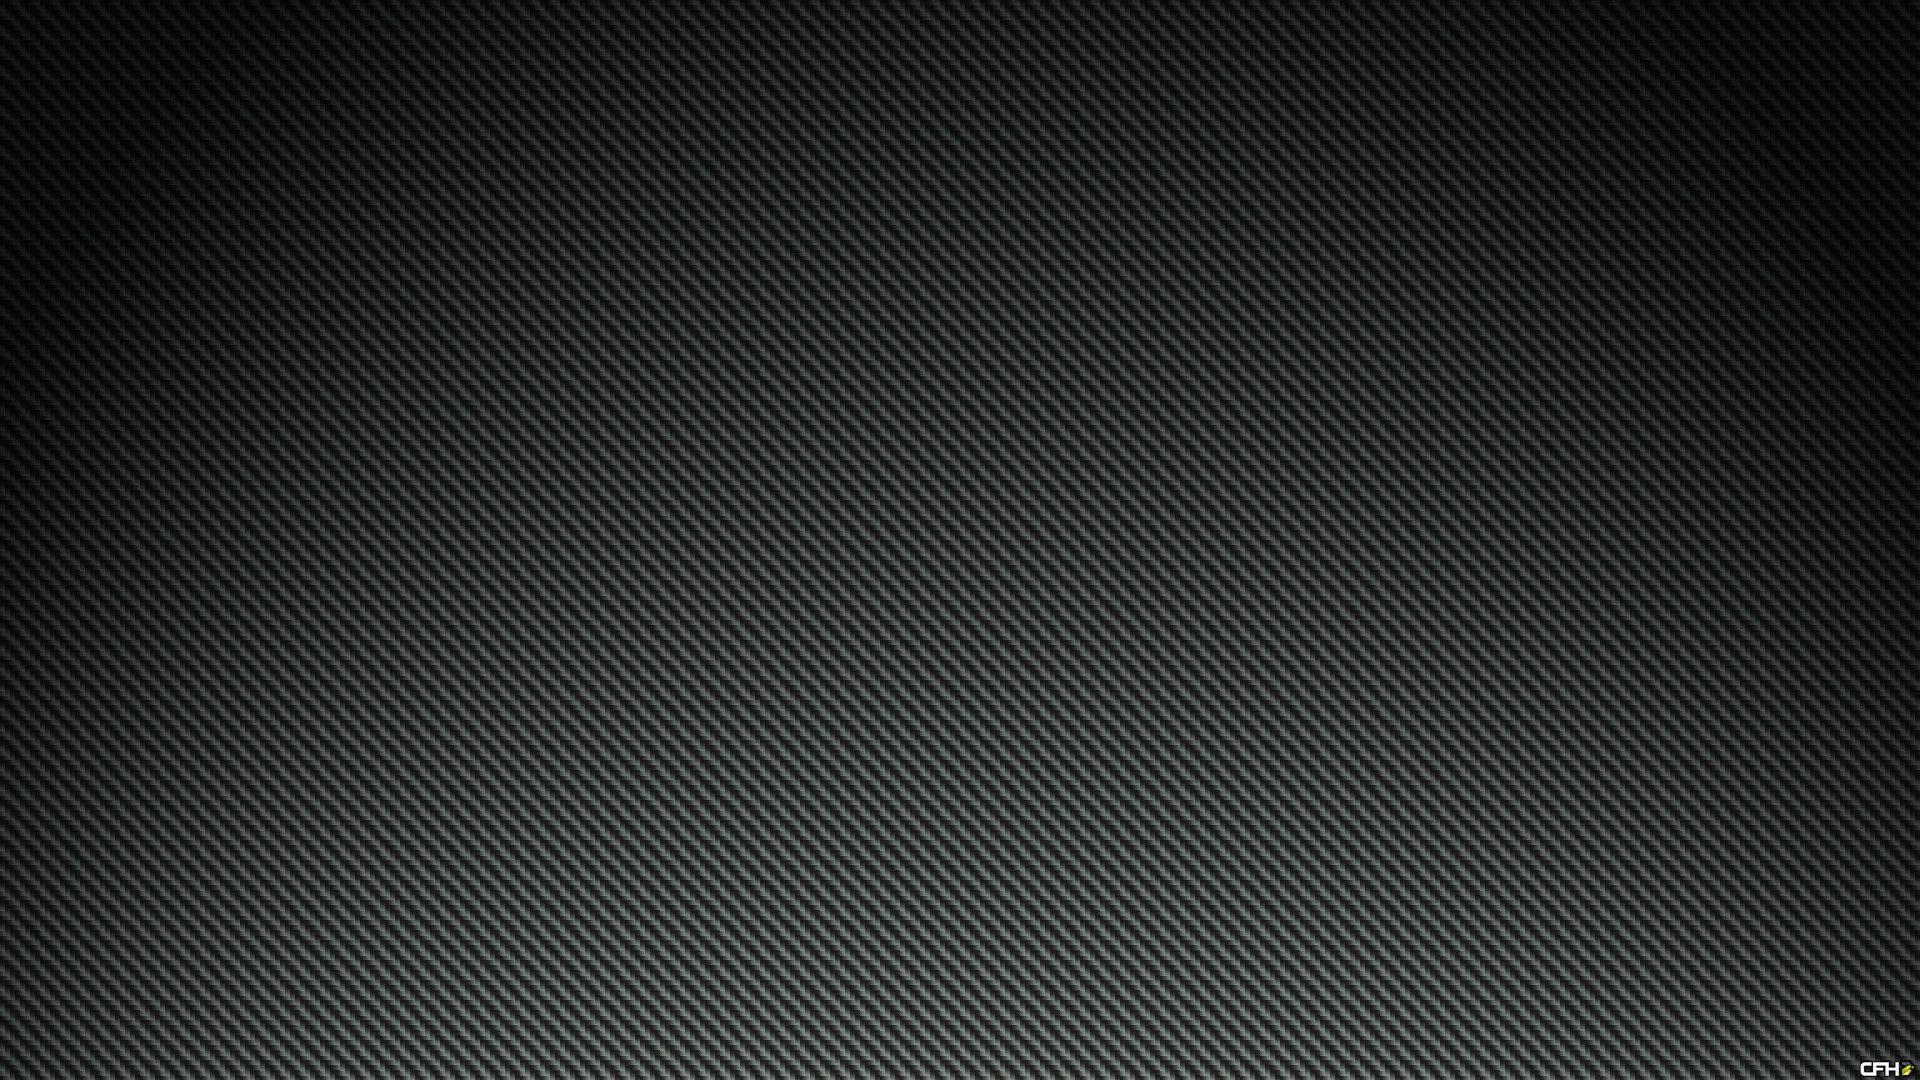 Wallpapers Carbon HD - Wallpaper Cave